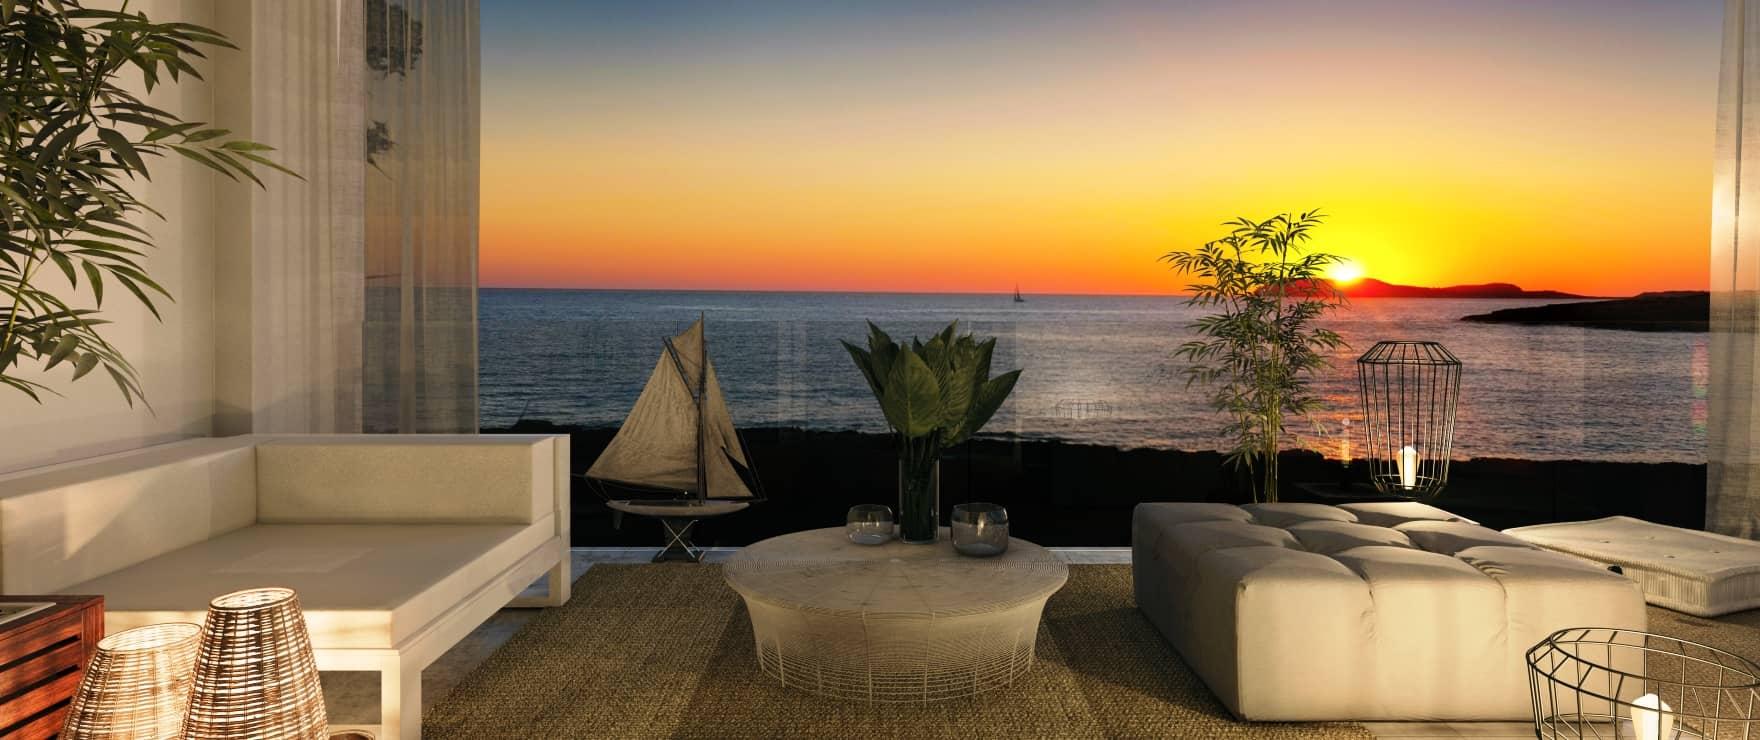 Sunset Ibiza - Cala Gracio (Ibiza)